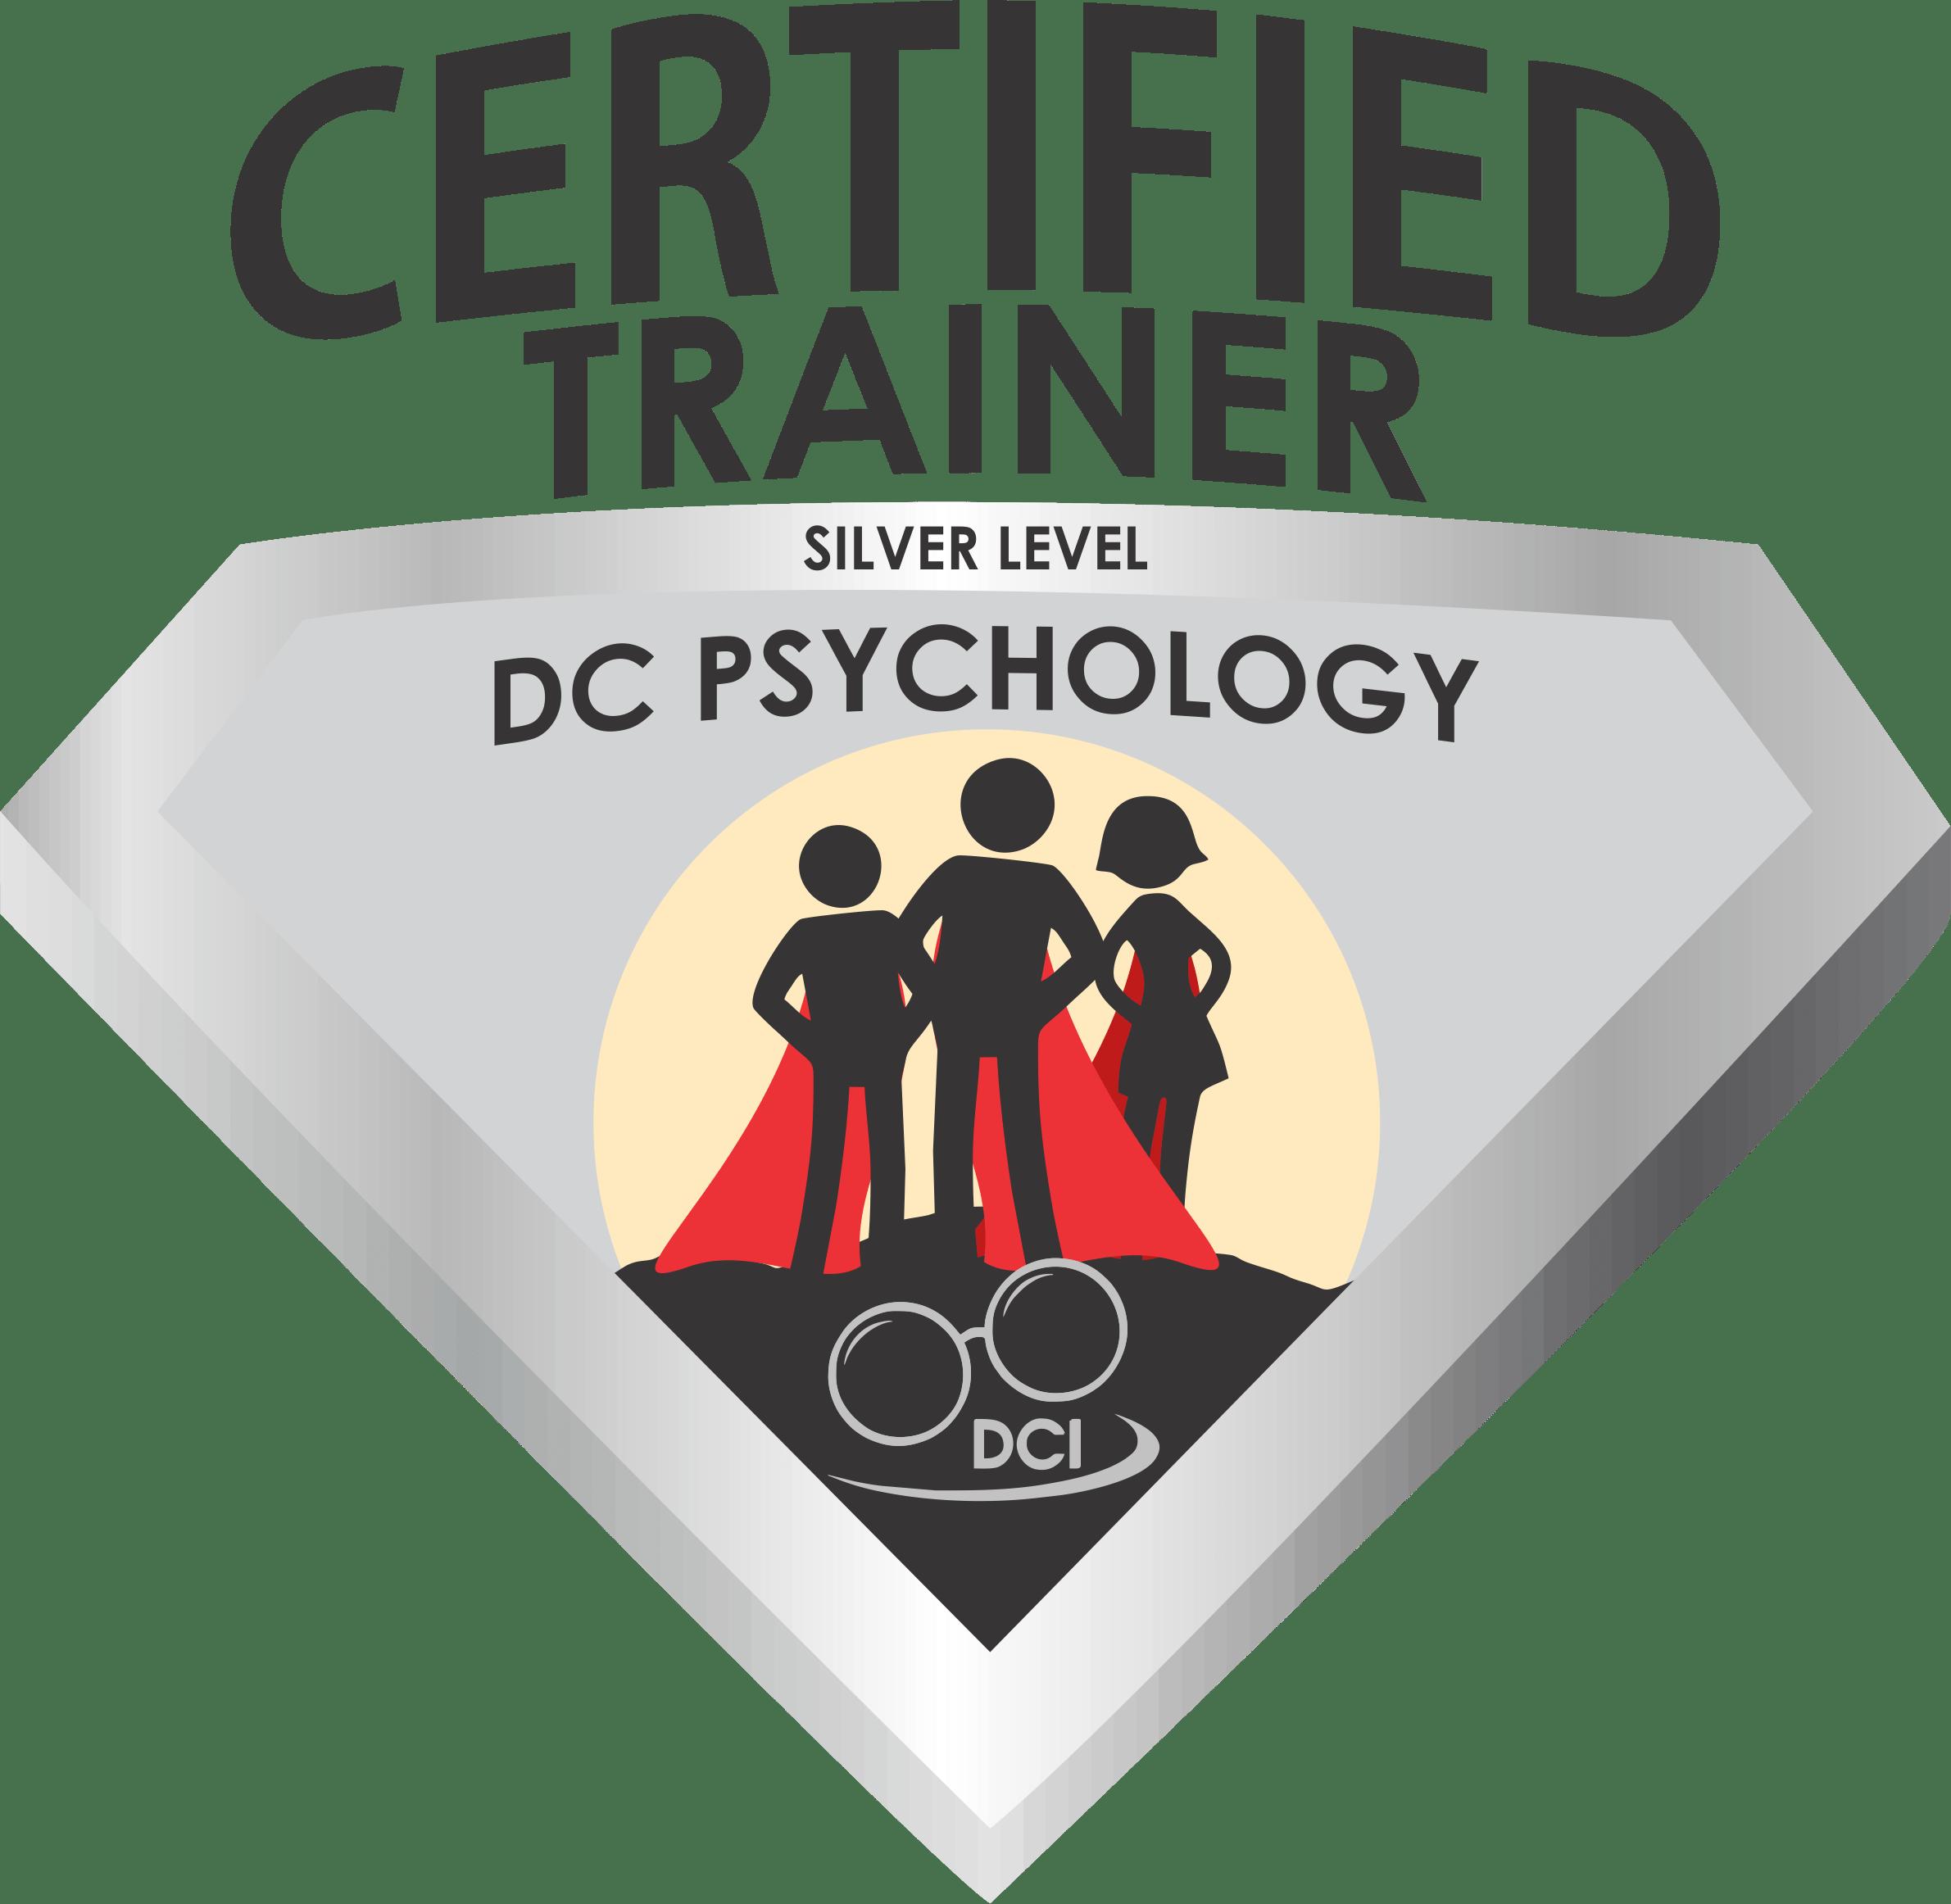 Achievement-Level-Certification-certified-trainer-silver